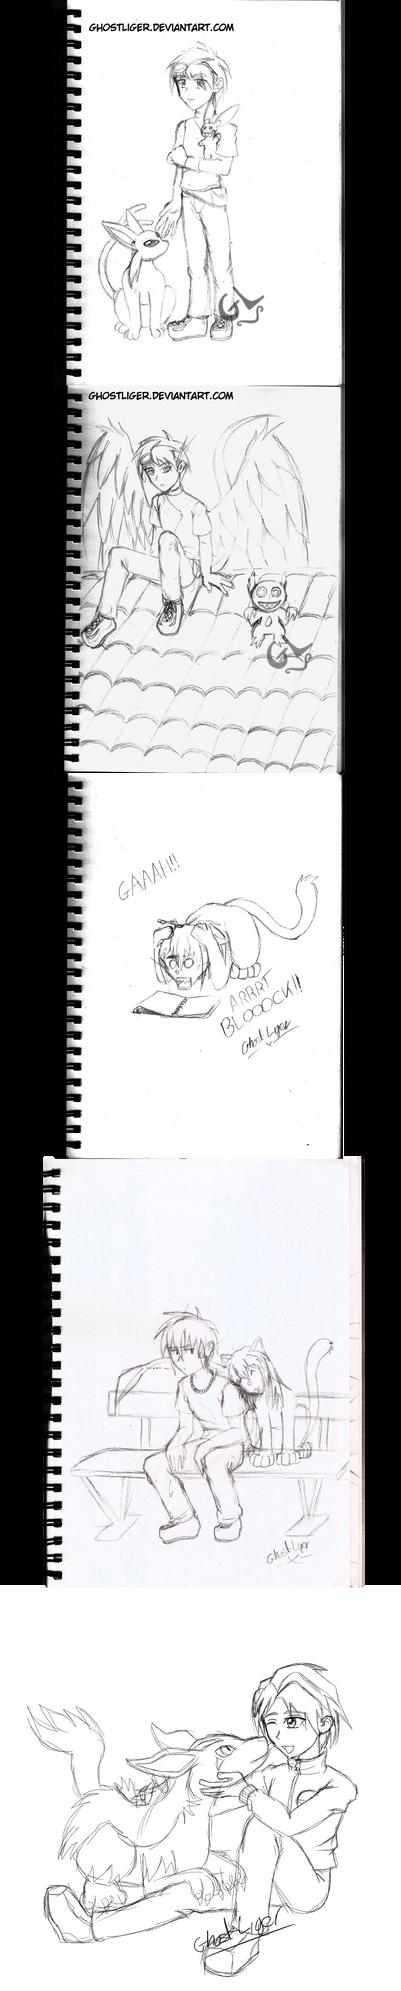 Old sketches by GhostLiger